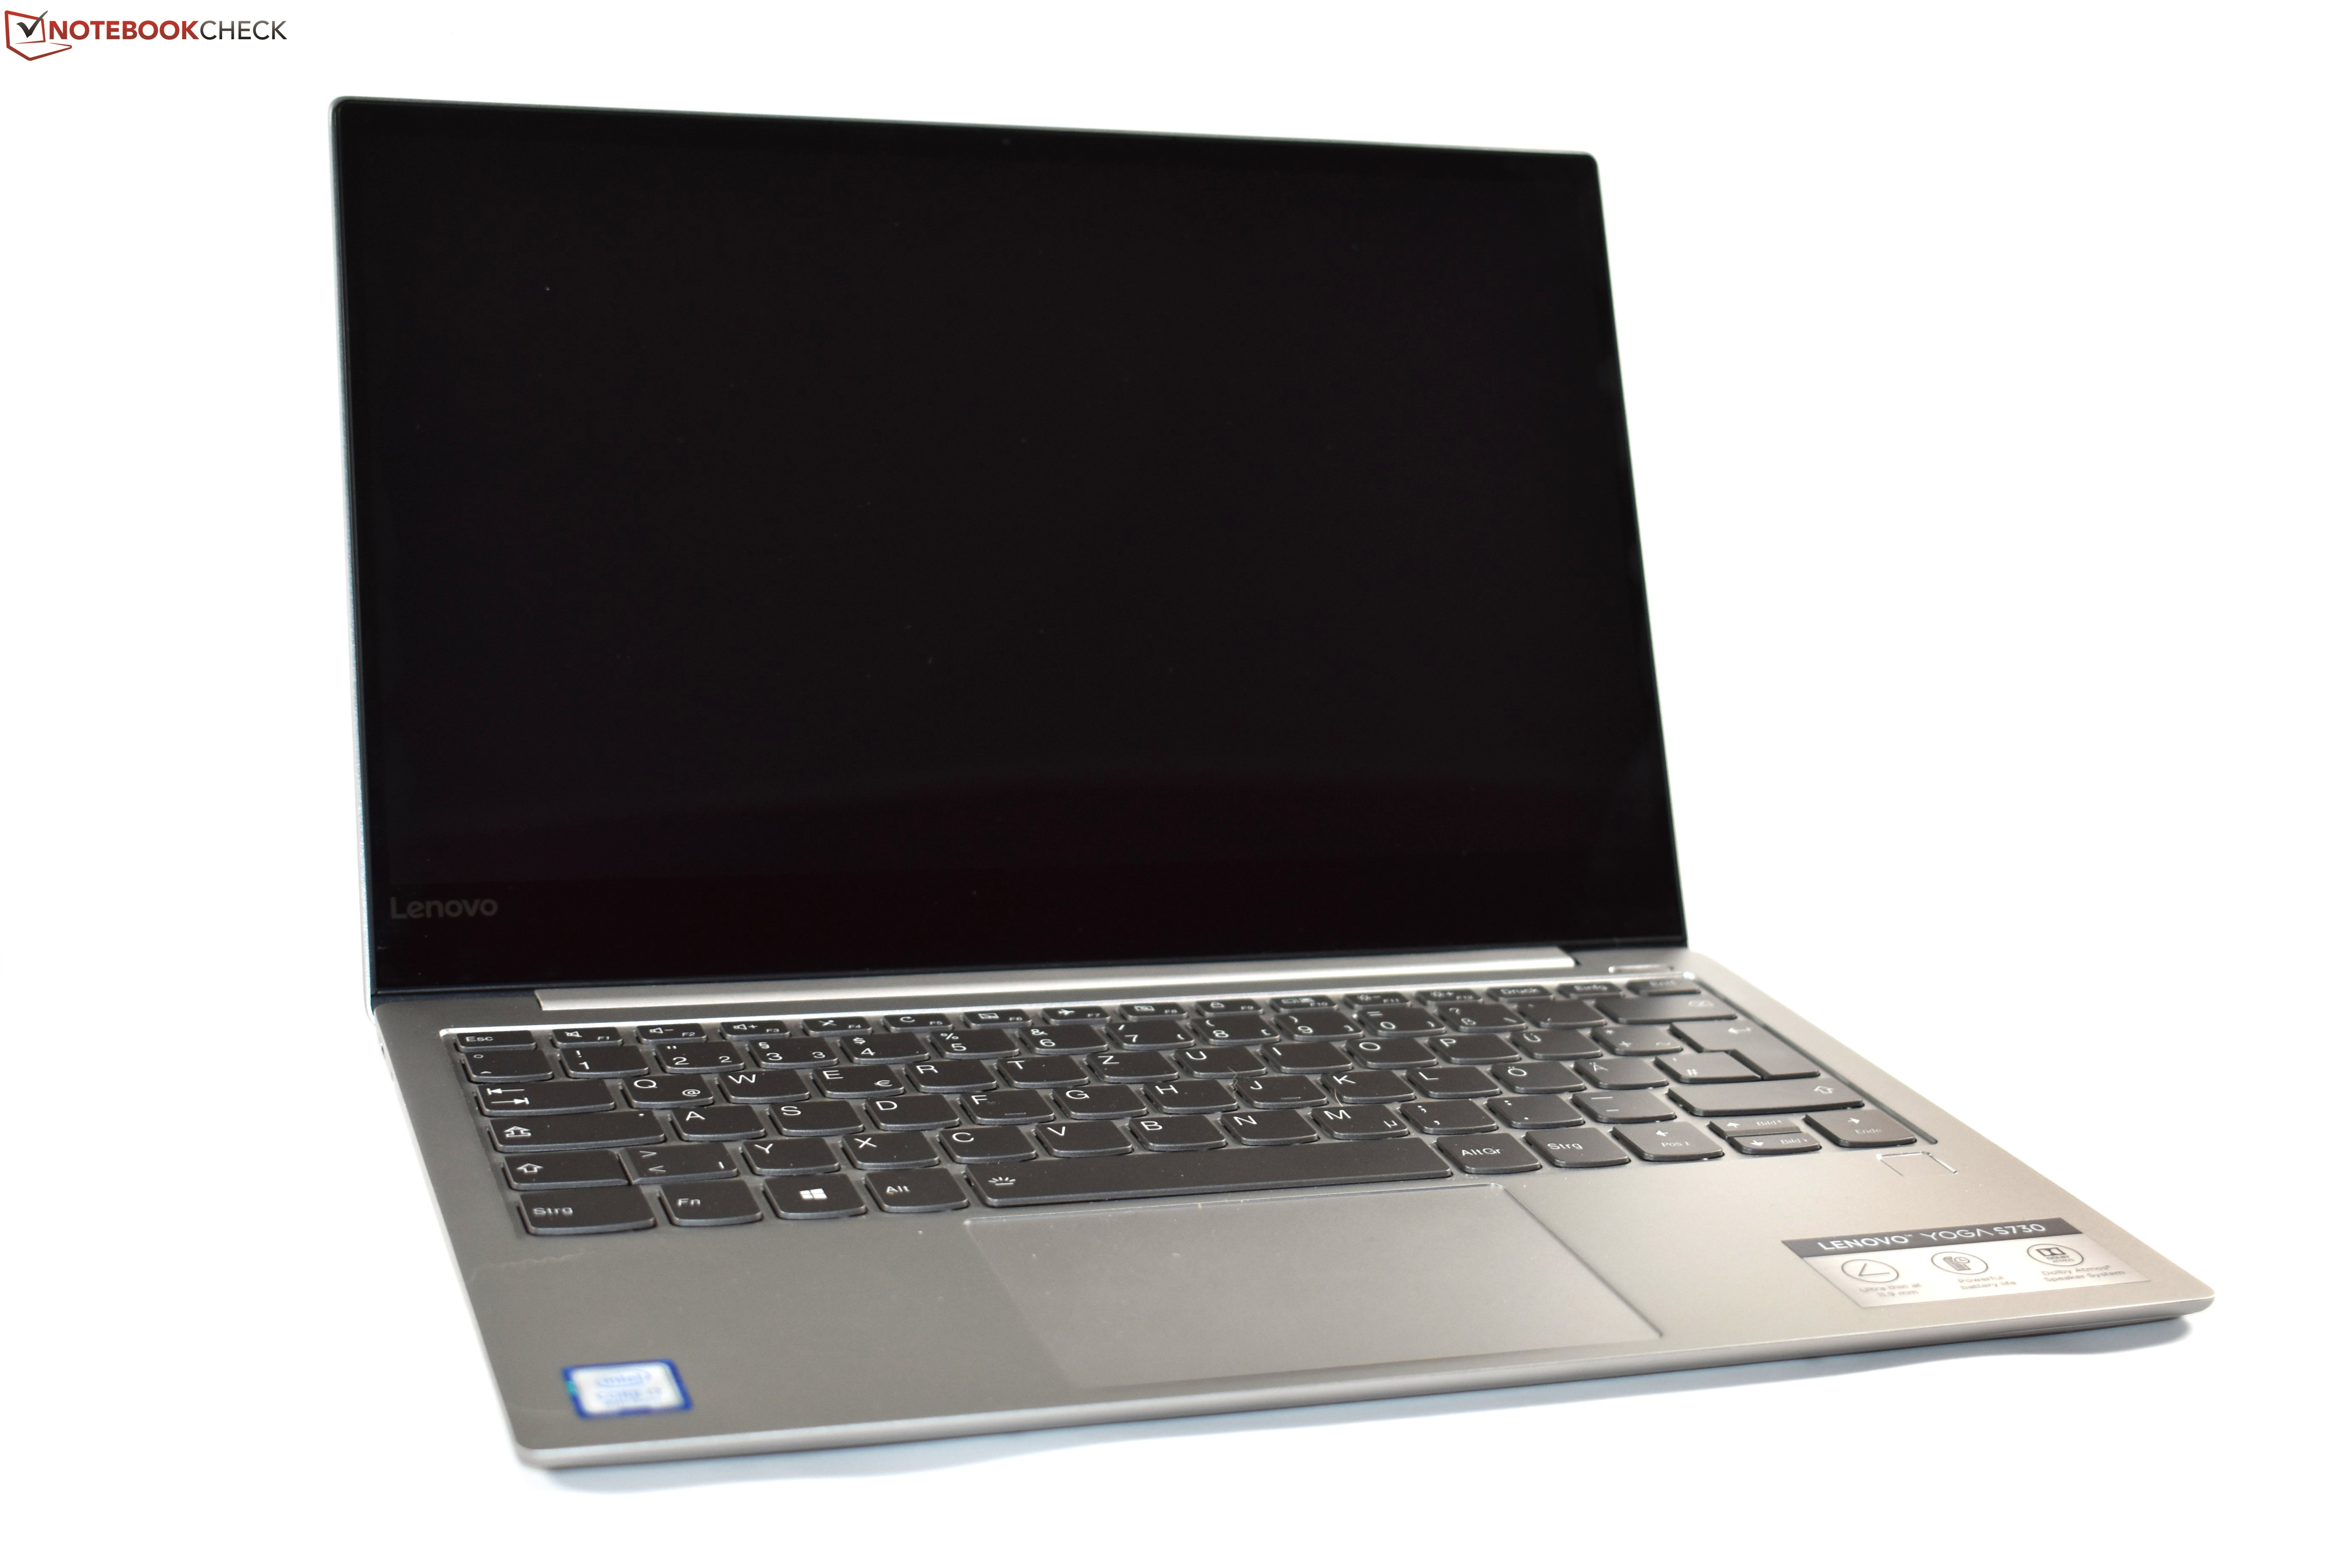 d11b6175fad Lenovo Yoga S730-13IWL (FHD, Core i7-8565U) Laptop Review ...